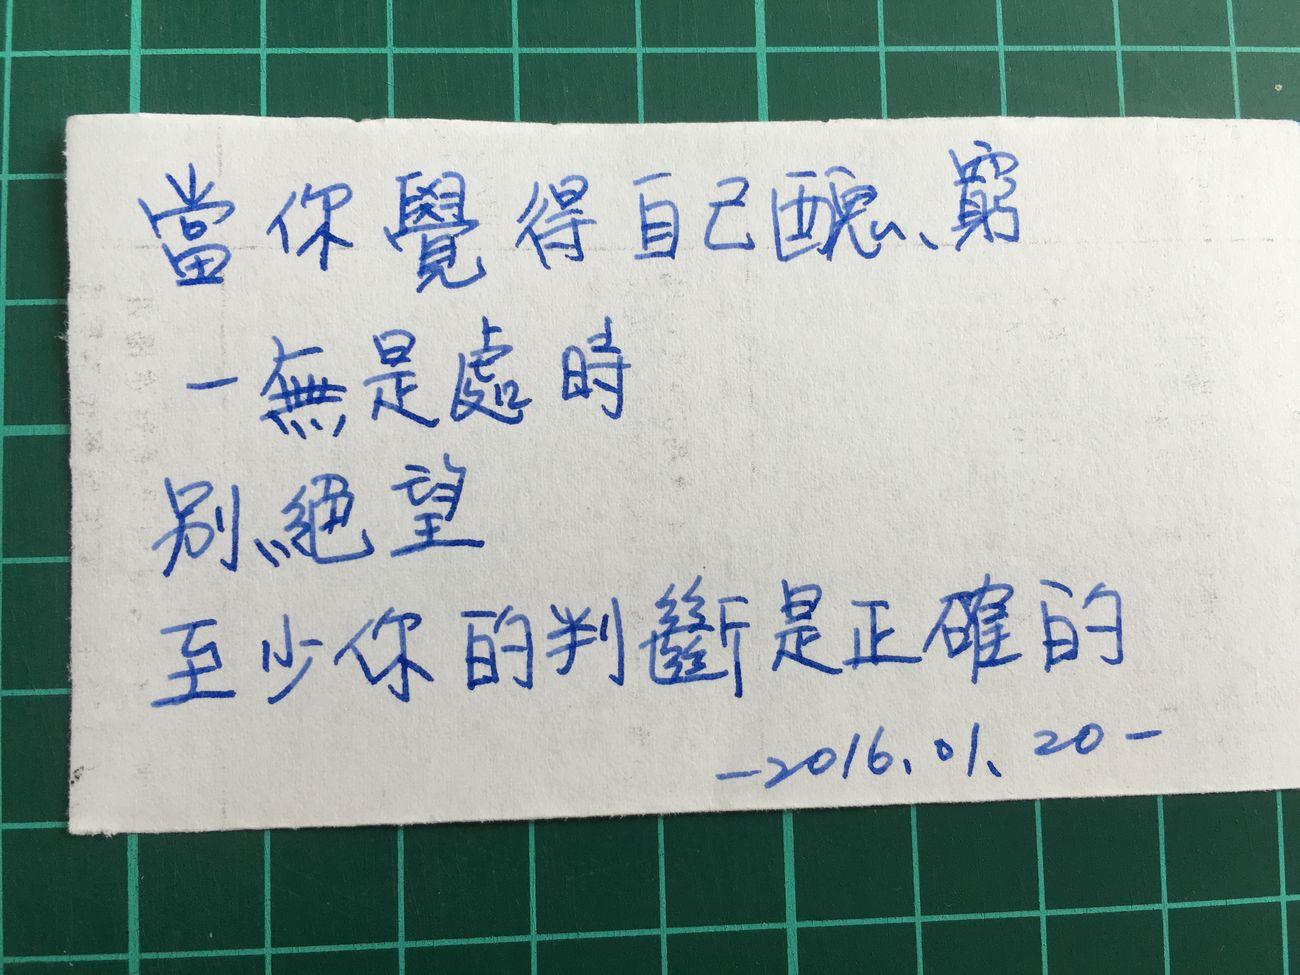 Lamy January Taiwanese Kaohsiung 臺灣 Taiwan 高雄 鋼筆 一月 中文 文具 墨水 前鎮區